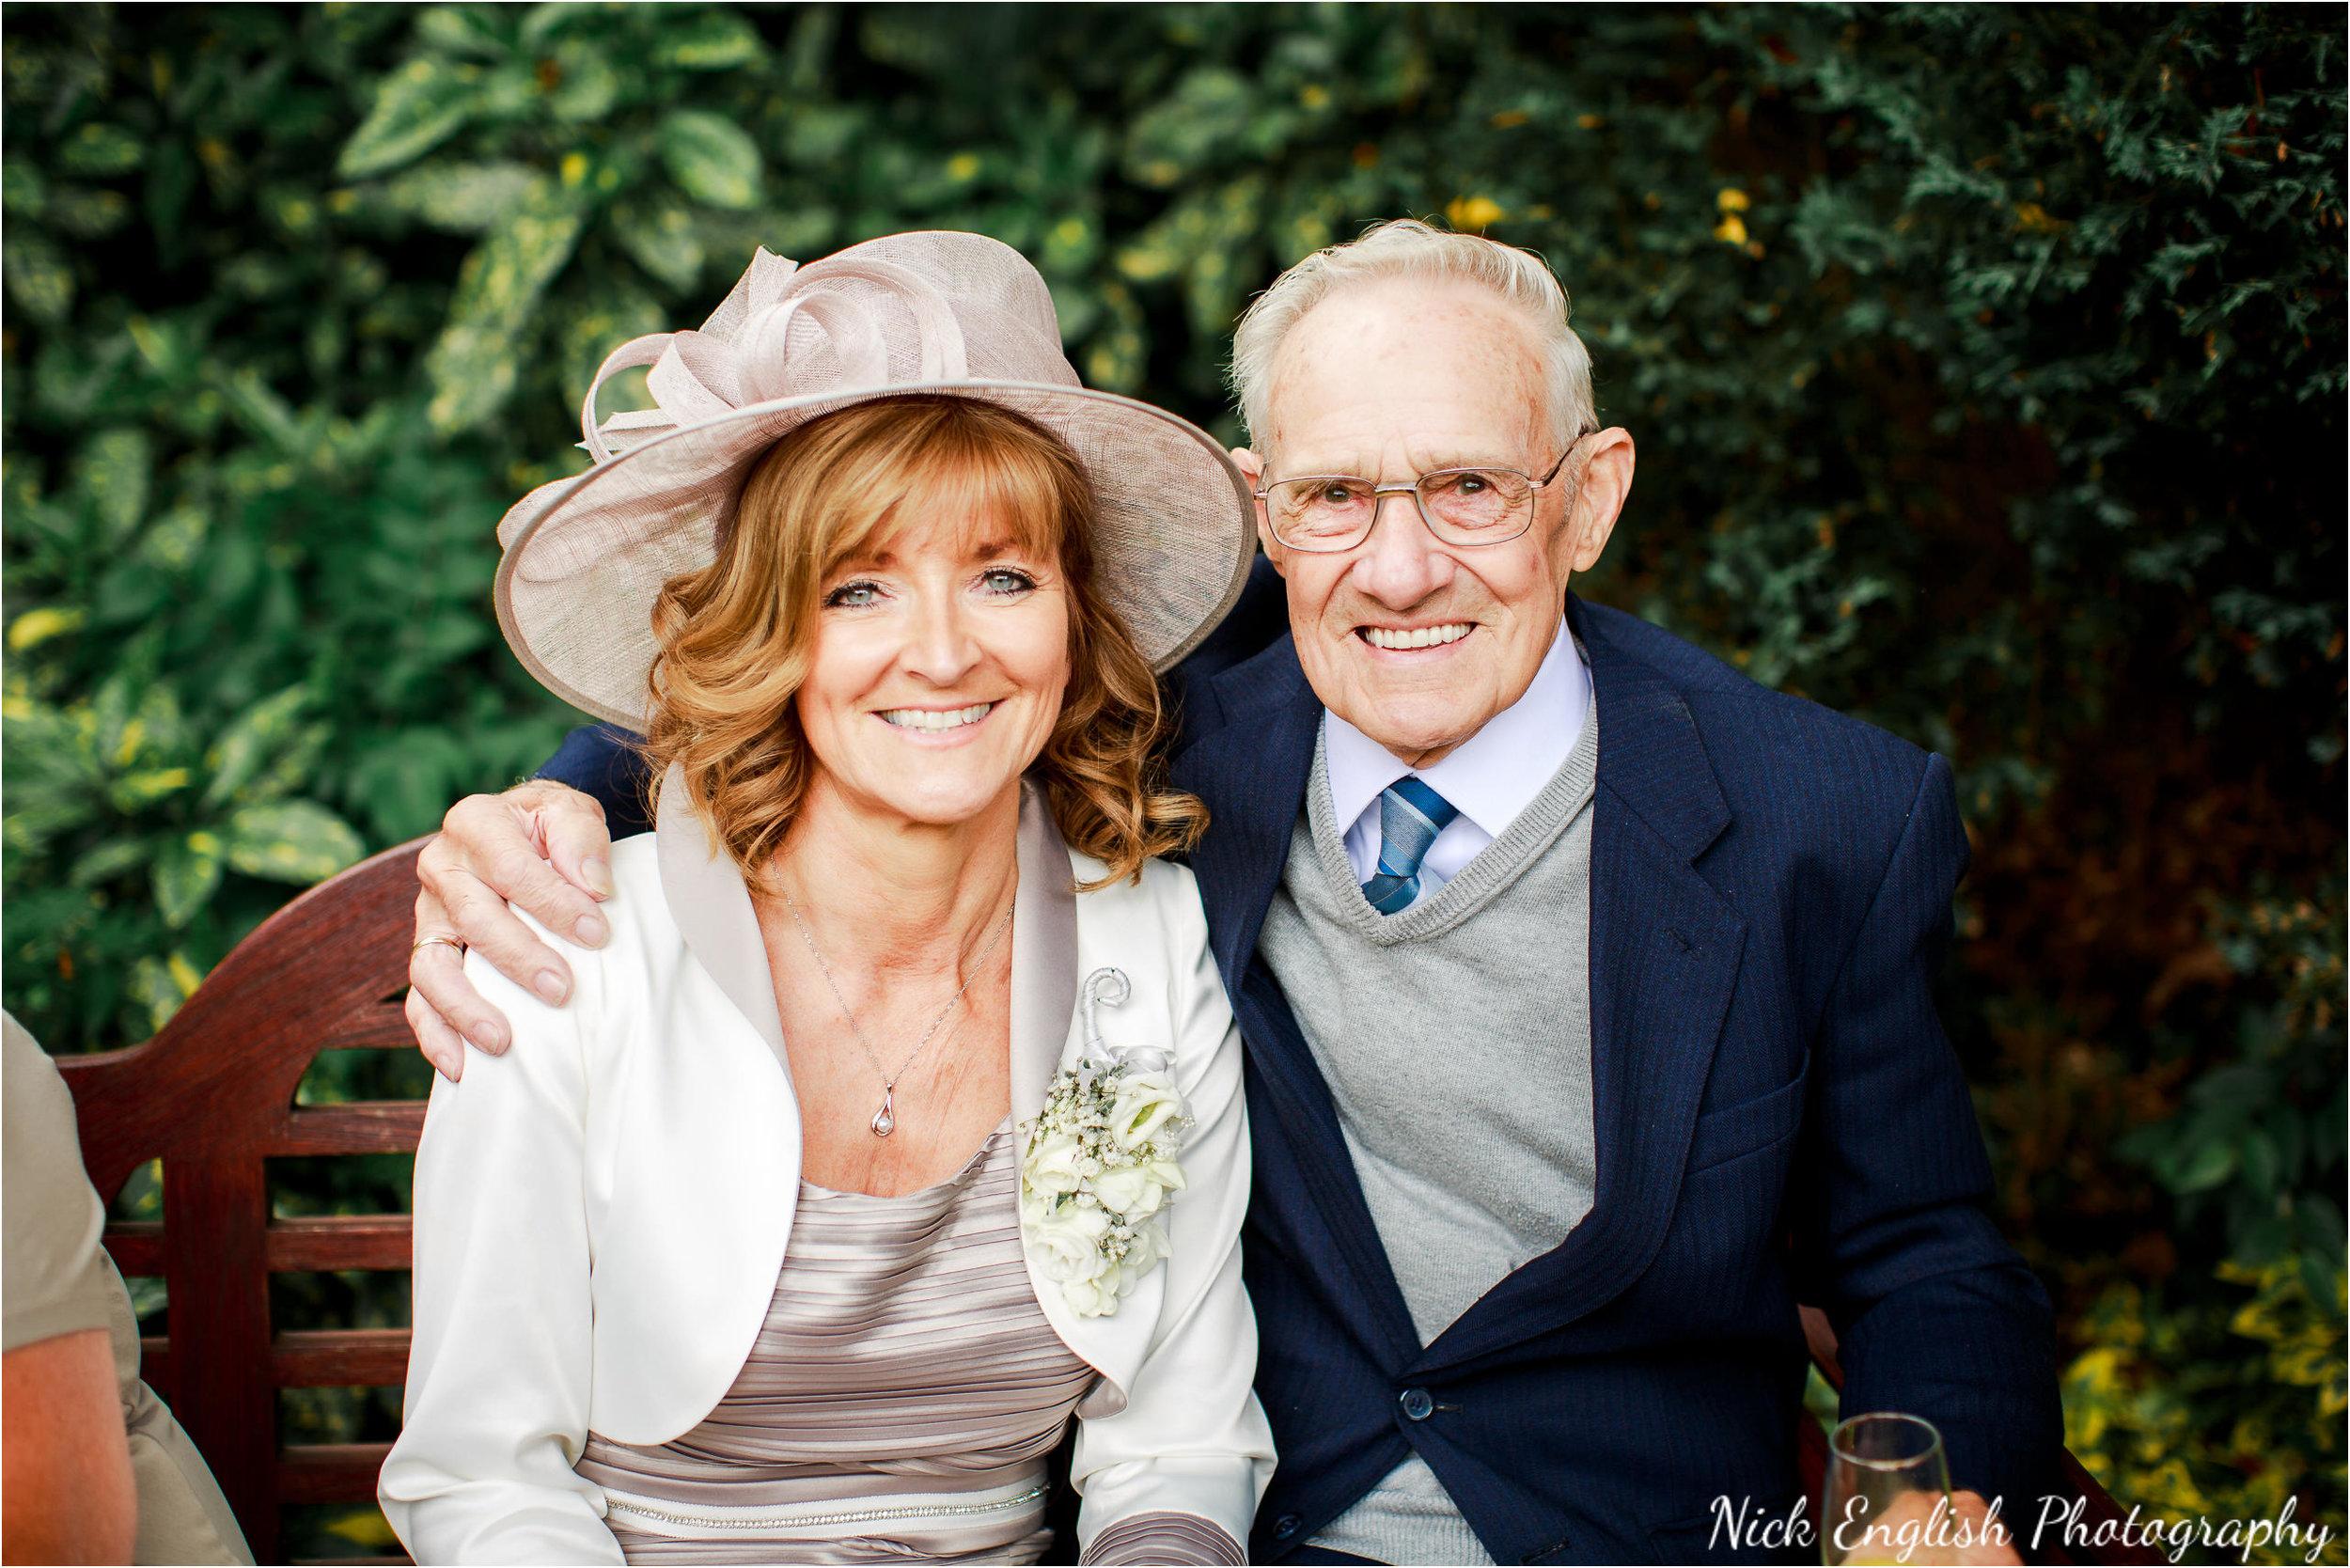 Emily David Wedding Photographs at Barton Grange Preston by Nick English Photography 123jpg.jpeg